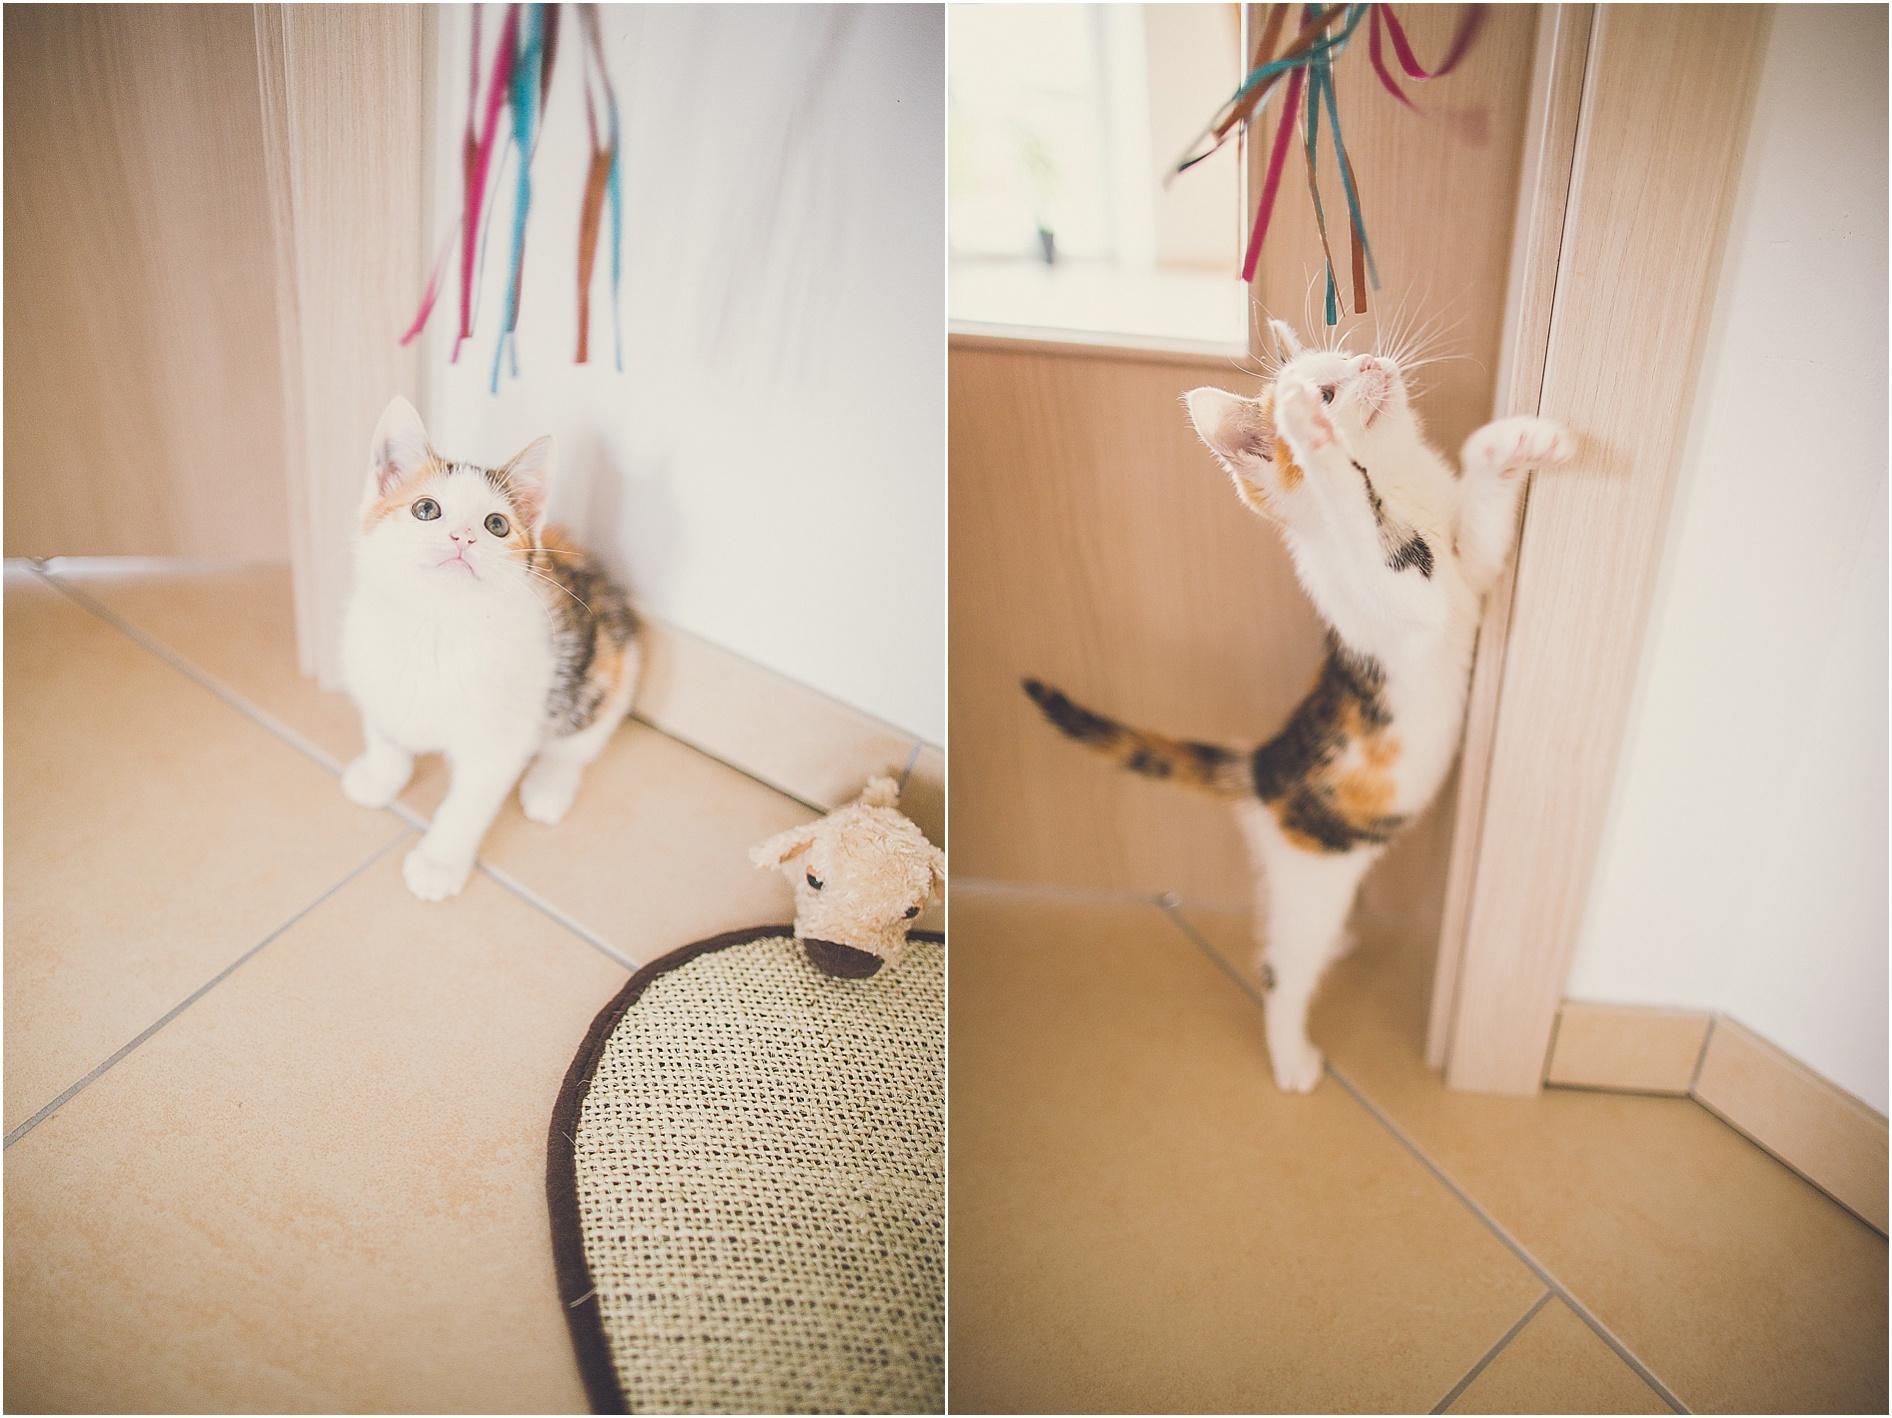 2014-07-23_0004 Paula & Frieda, zwei bezaubernde Kitten